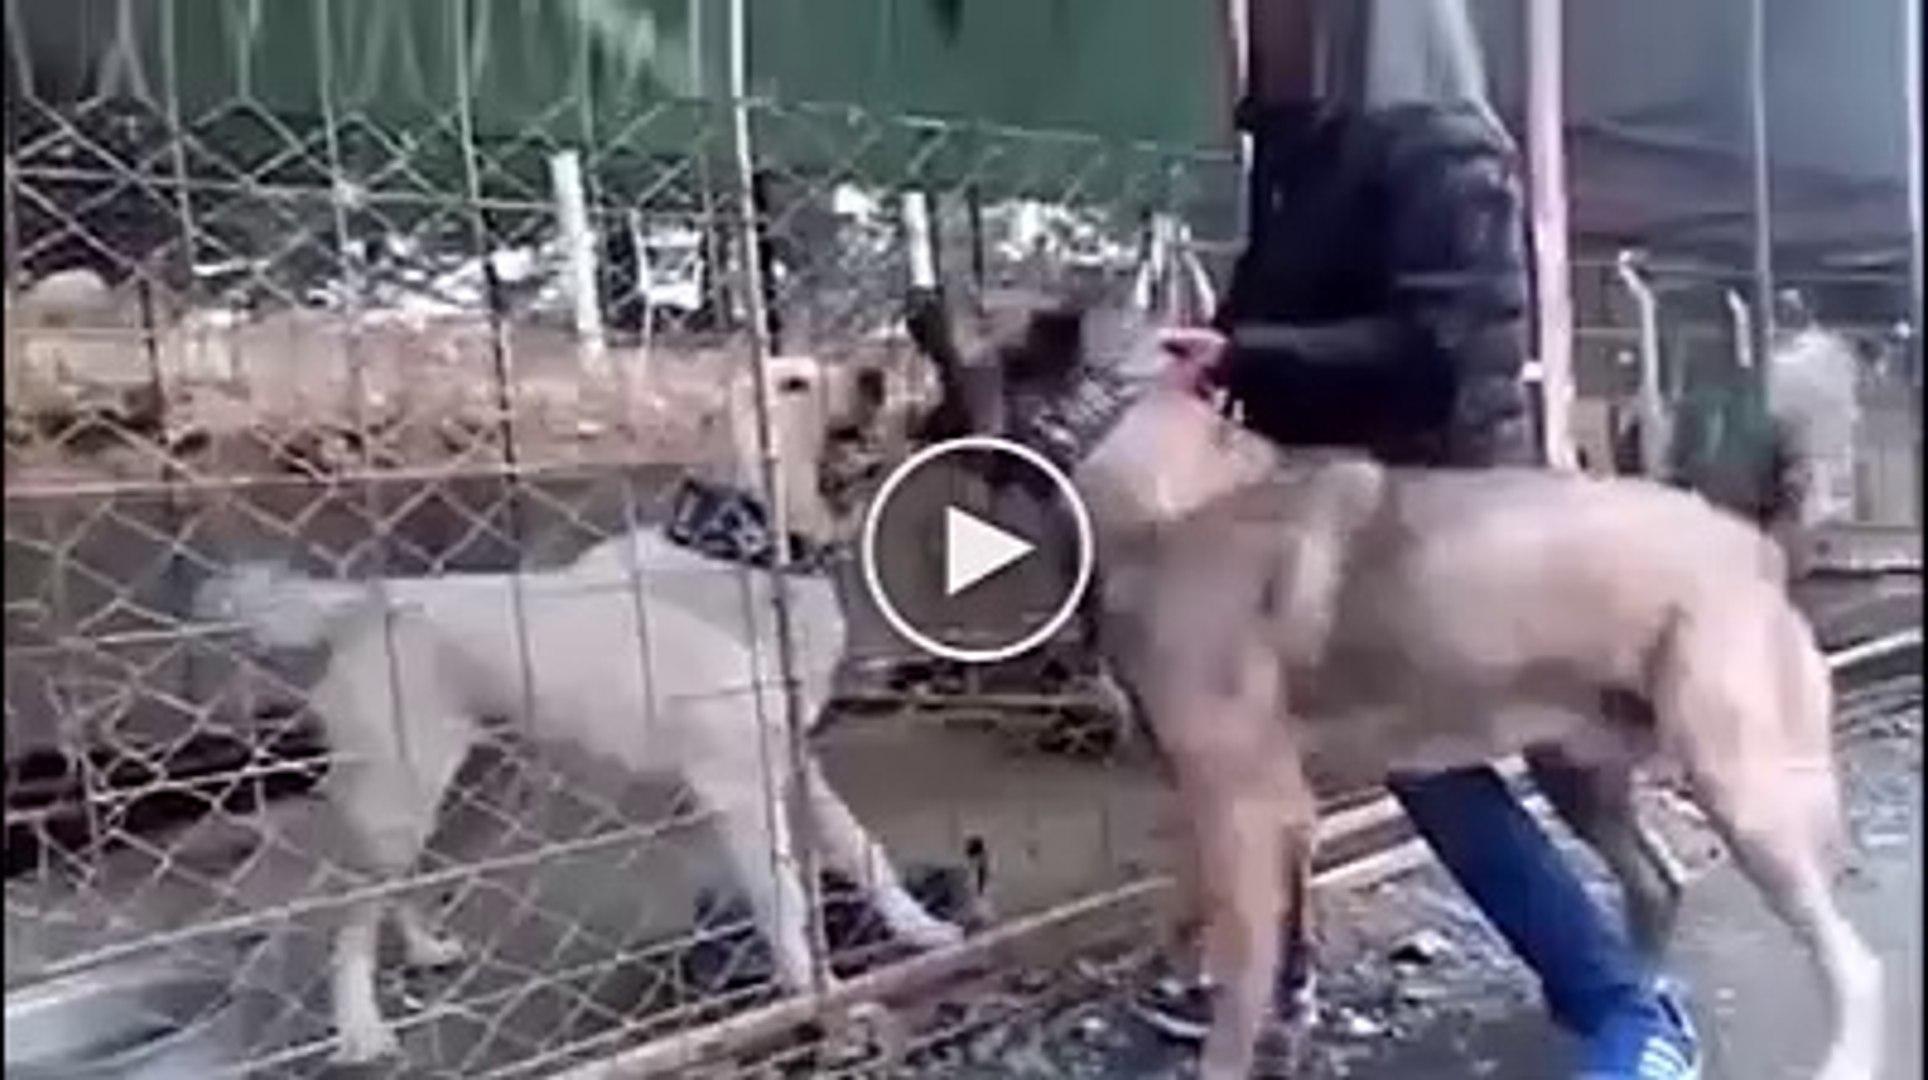 AKBAS vs SiVAS KANGAL KOPEGi - AKBASH DOG vs KANGAL DOG